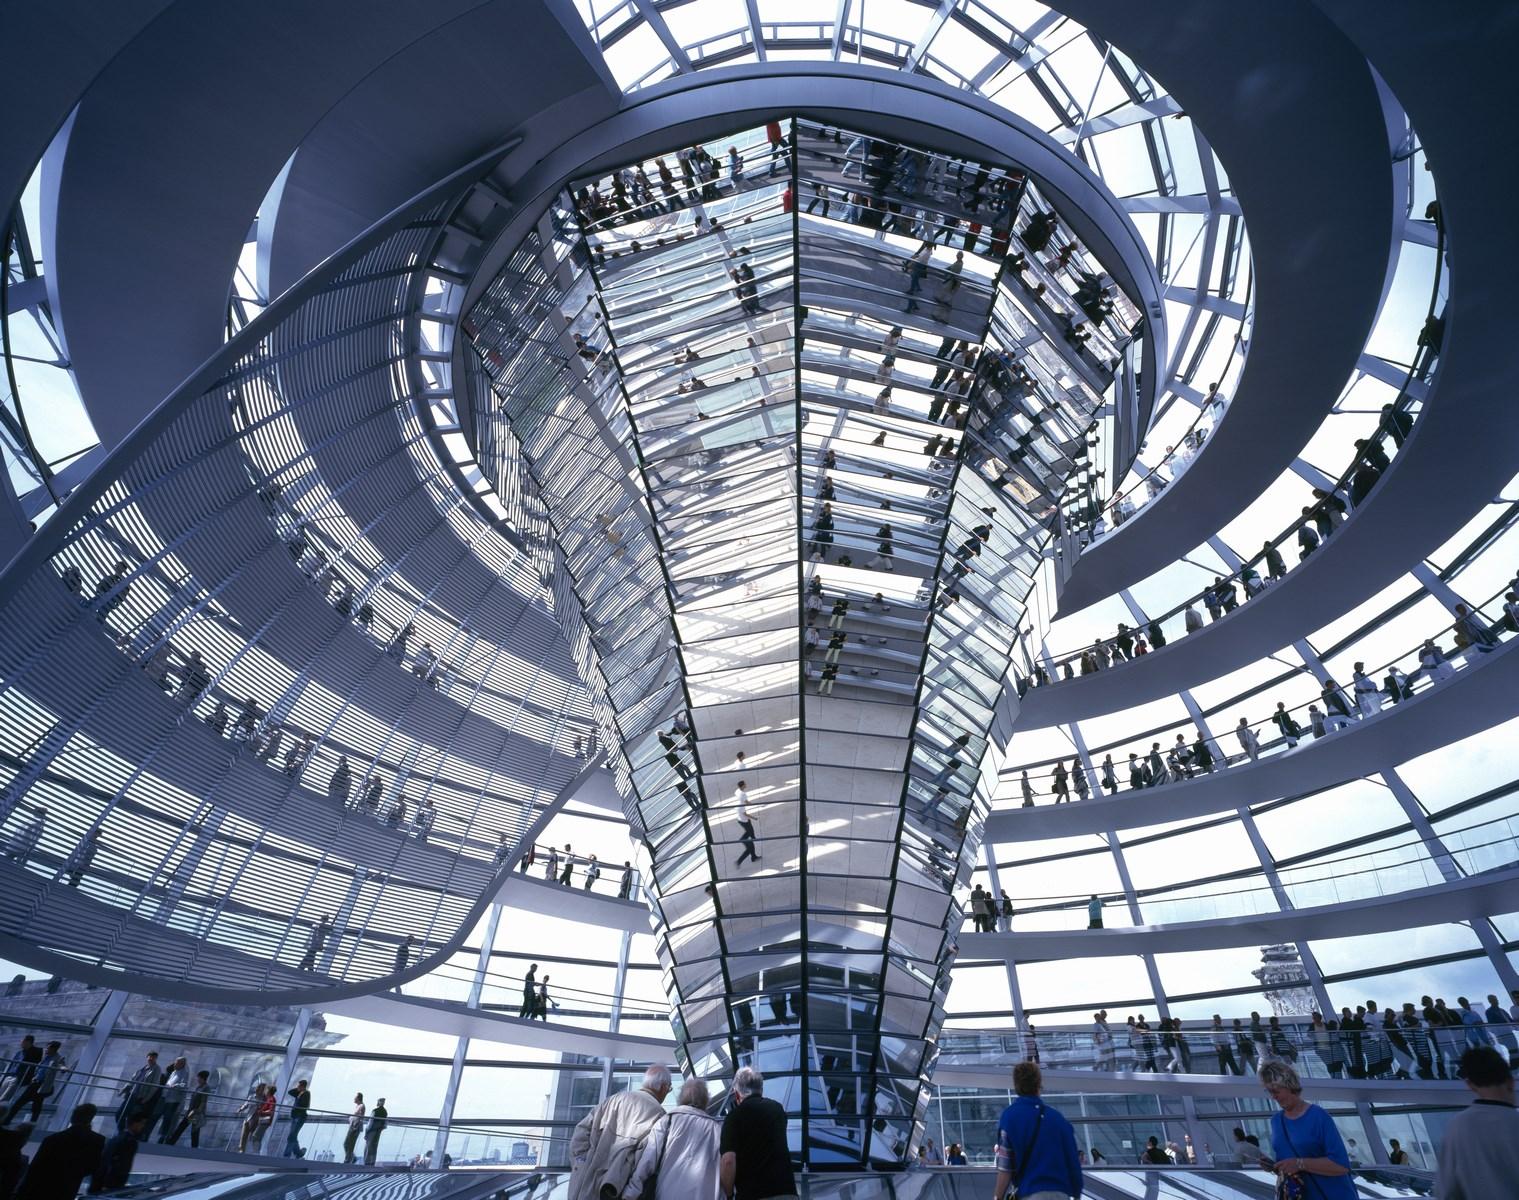 1999 - Reichstag, nuevo parlamento alemán, Berlín, Alemania.